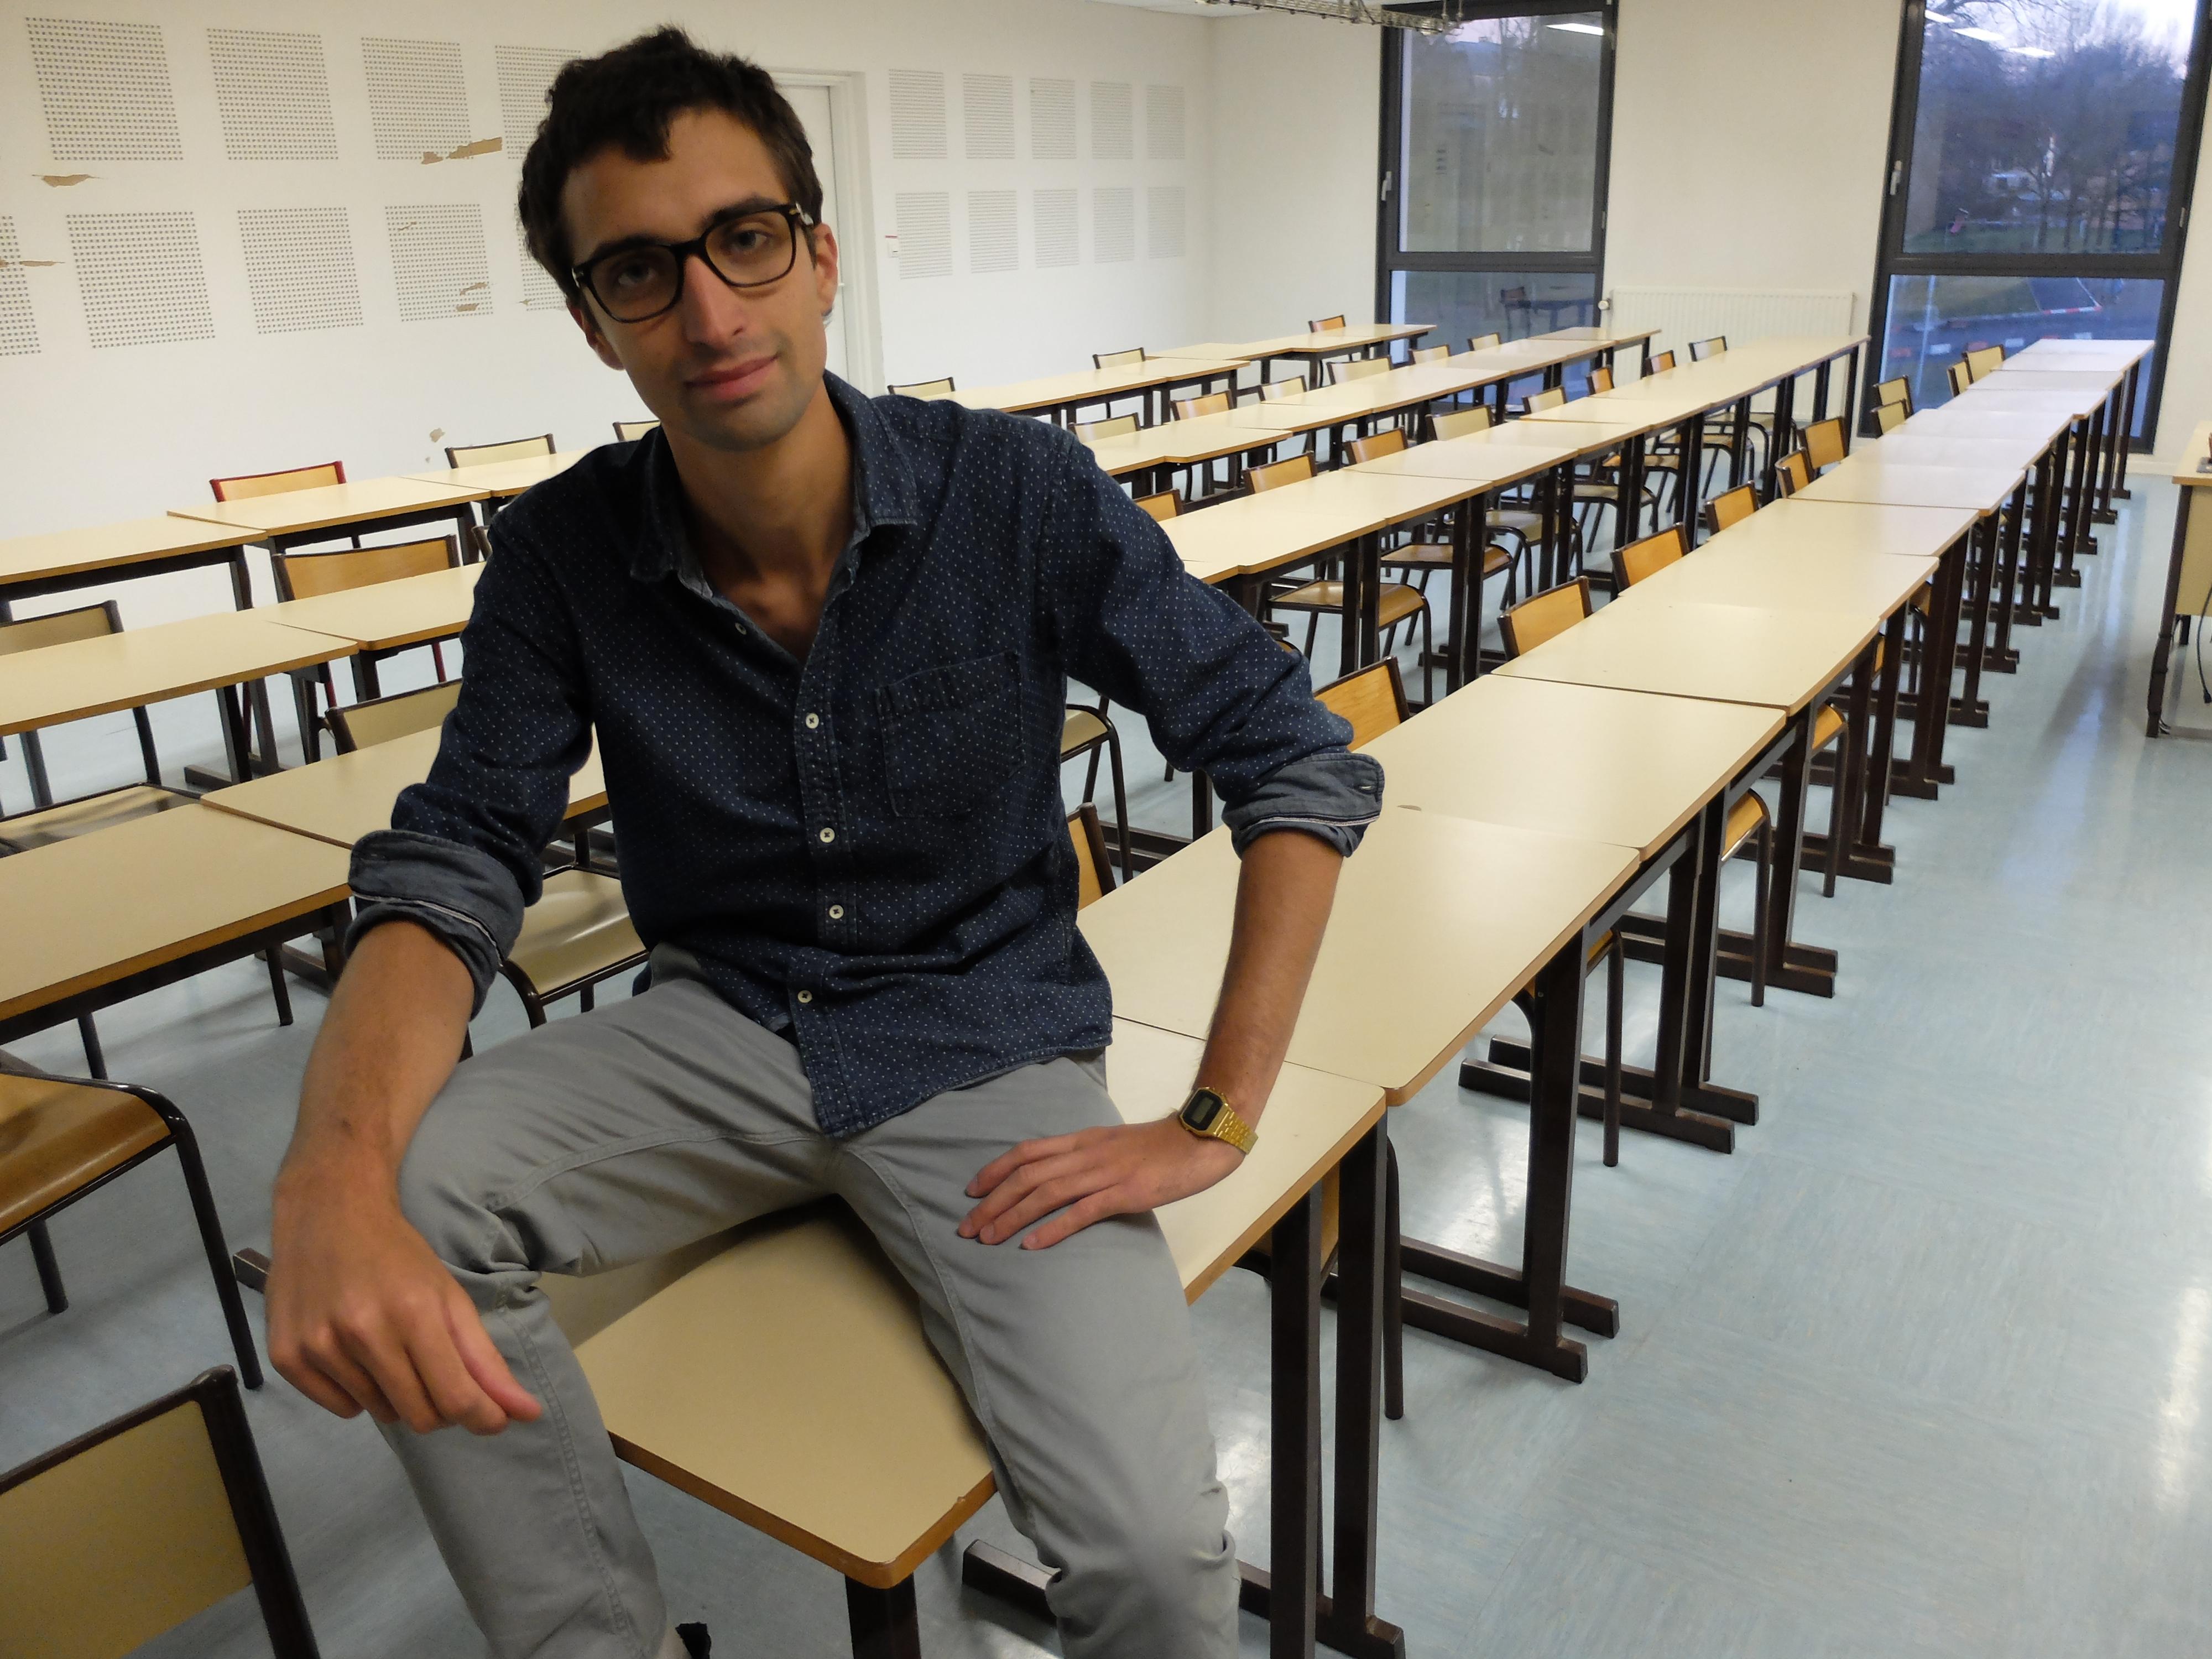 Romain_apprentissage_utbm